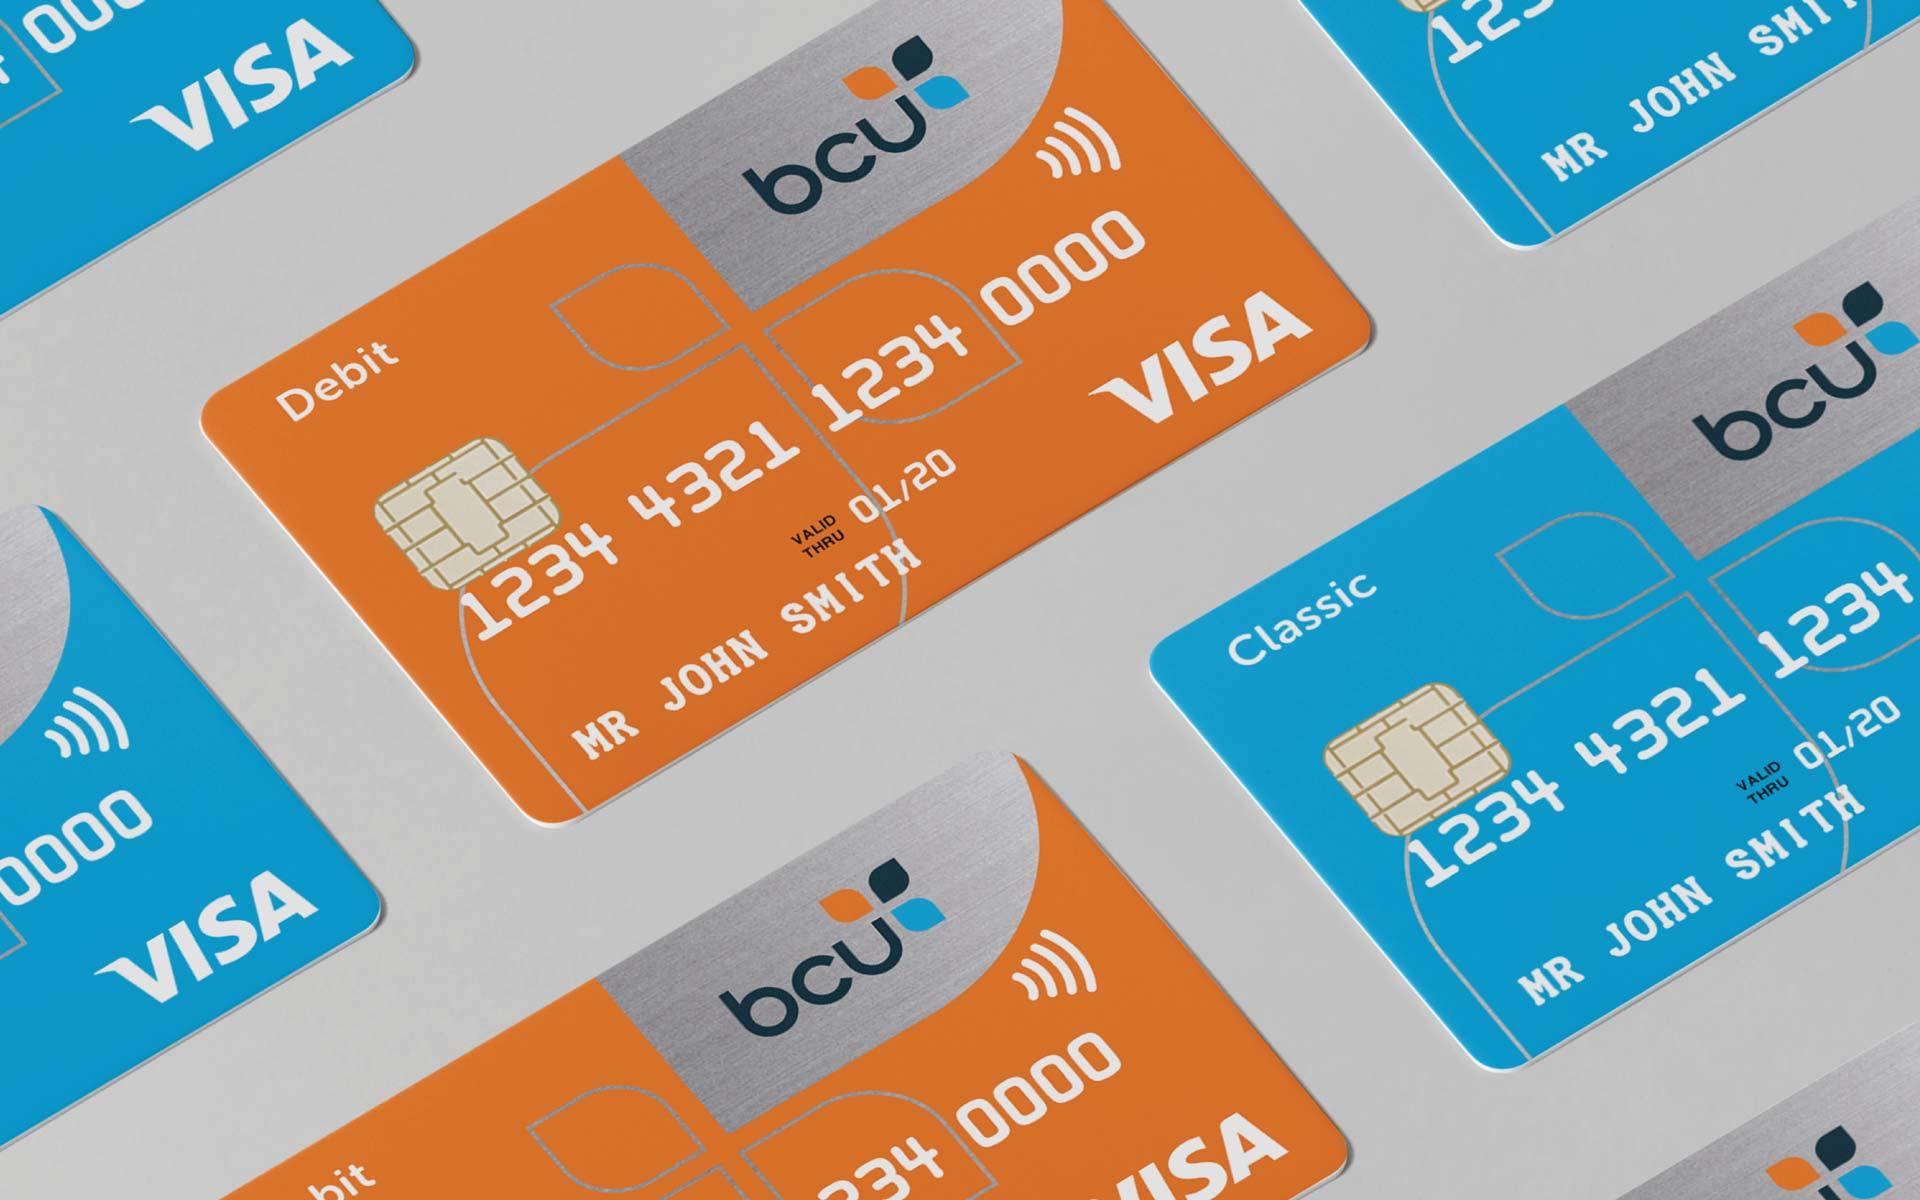 BCU User Experience Design Credit Cards